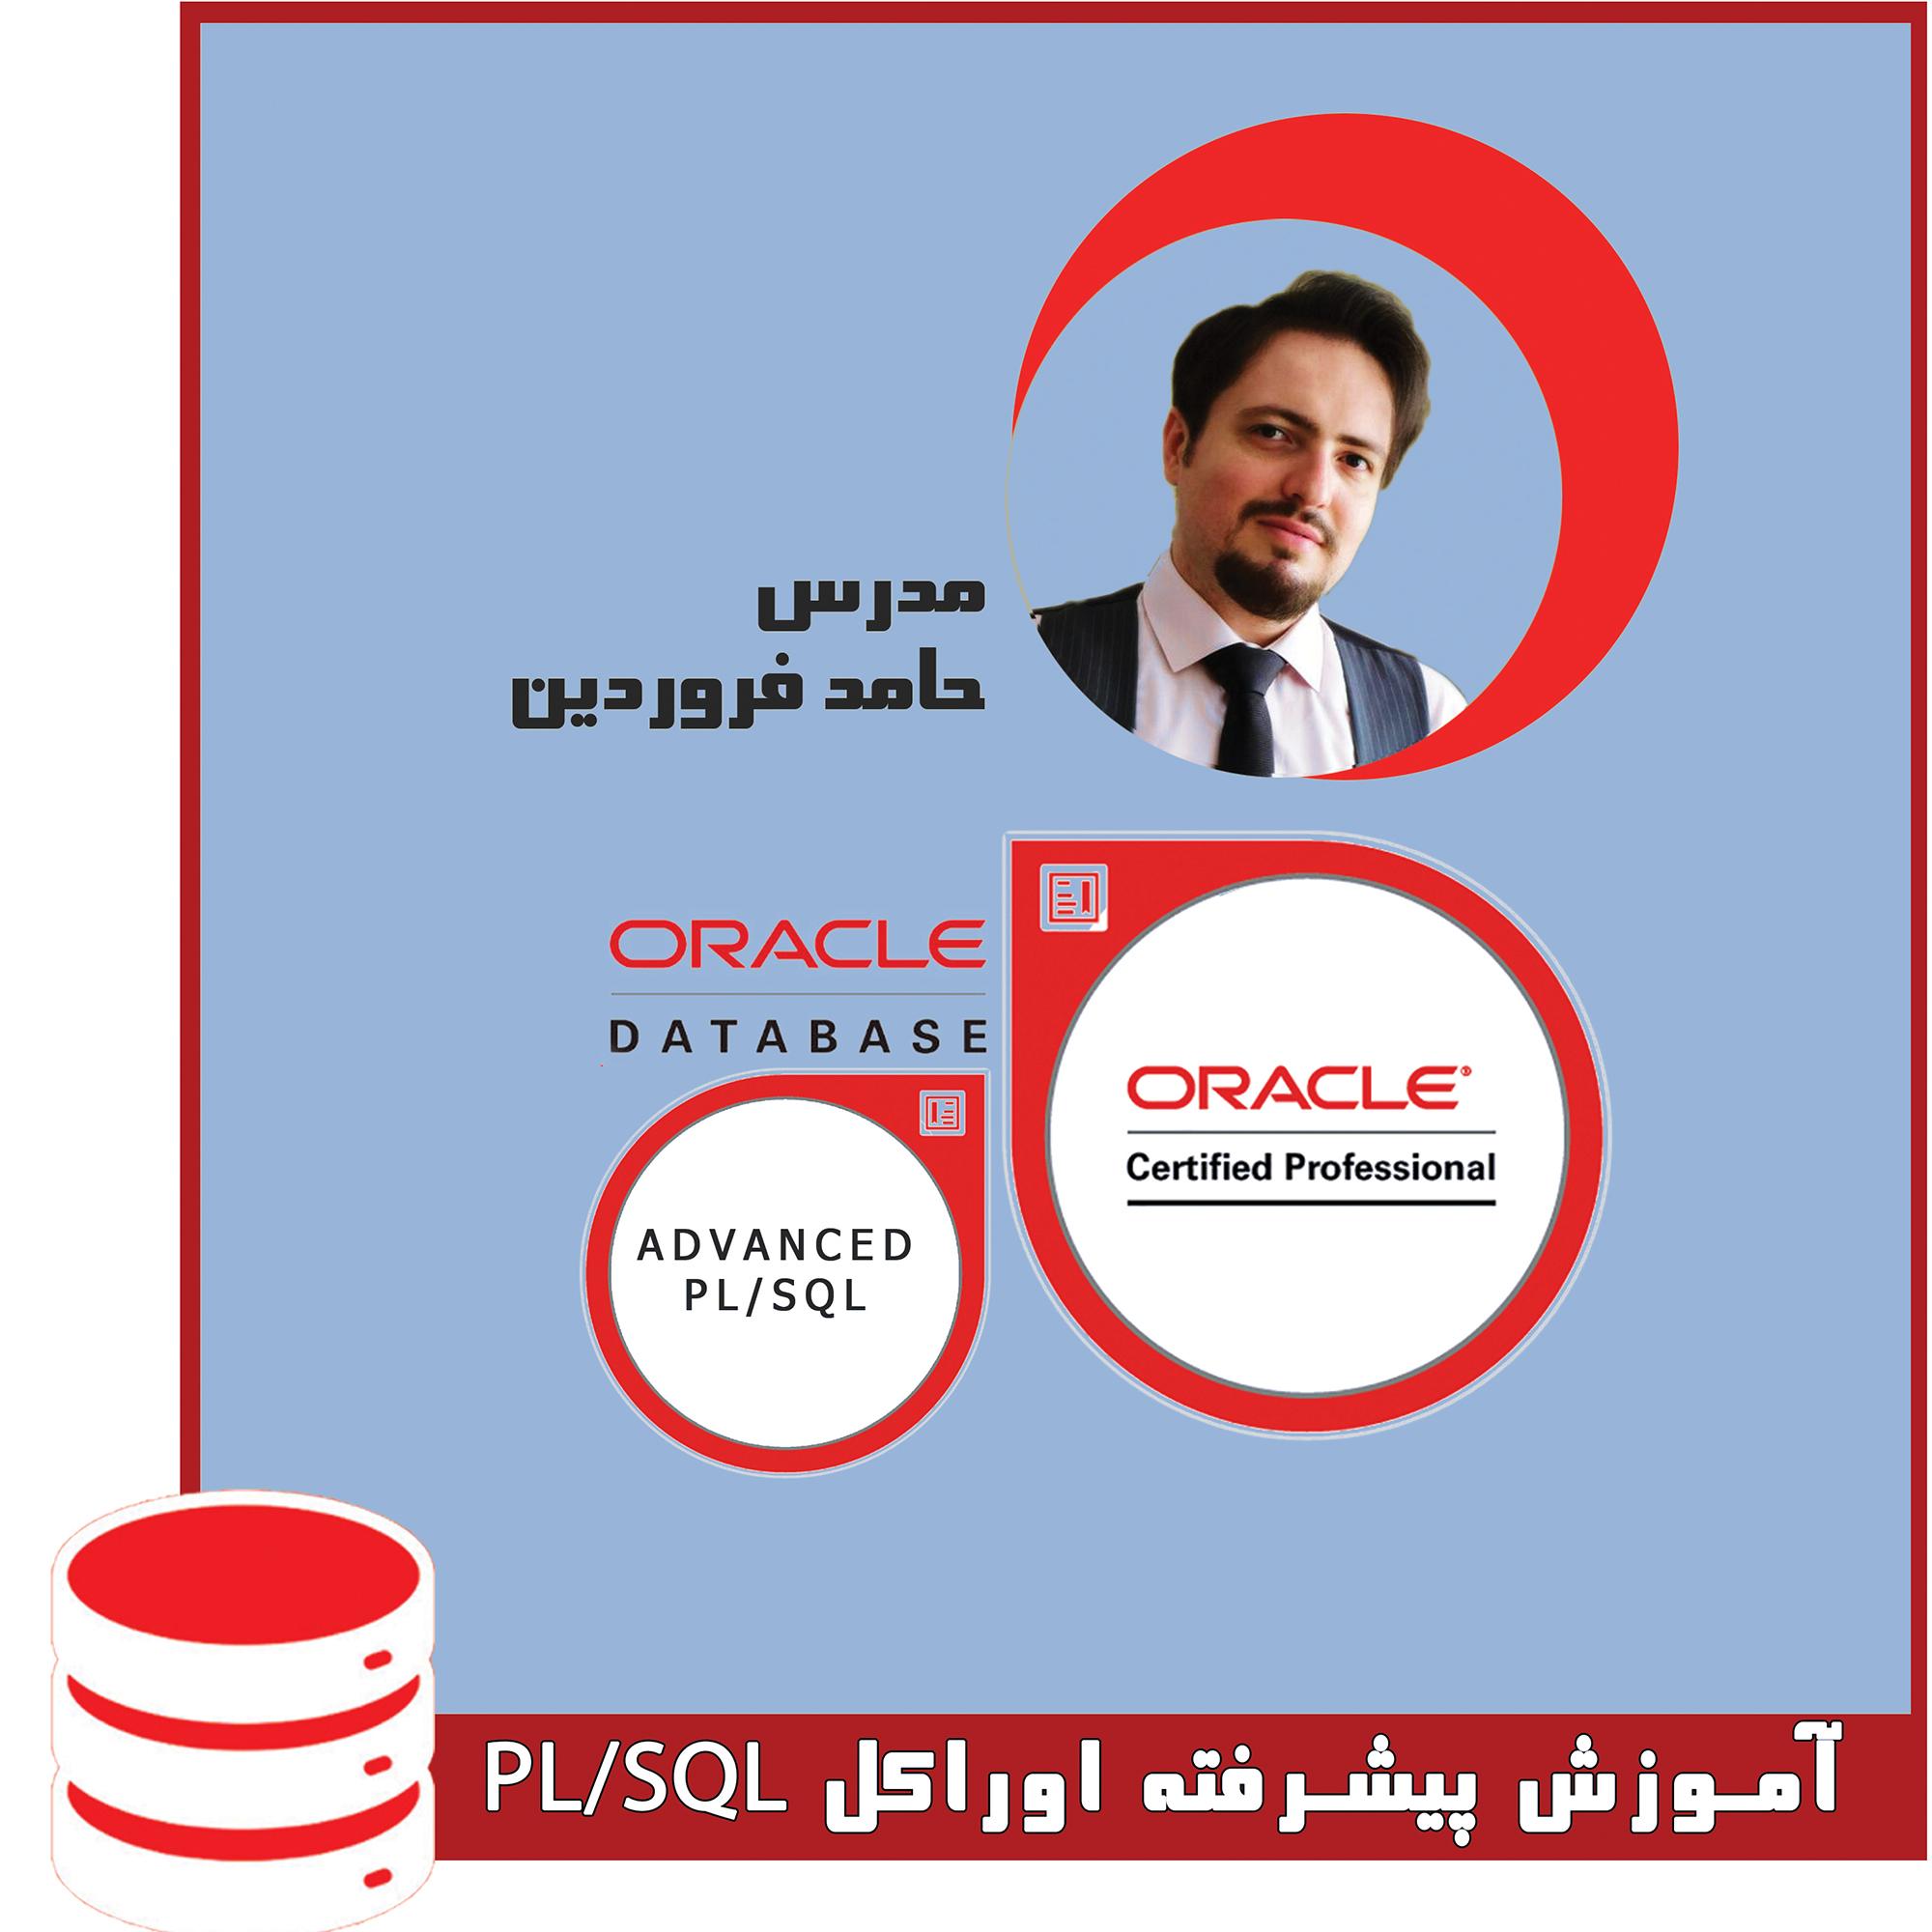 آموزش پیشرفته Oracle PL/SQL